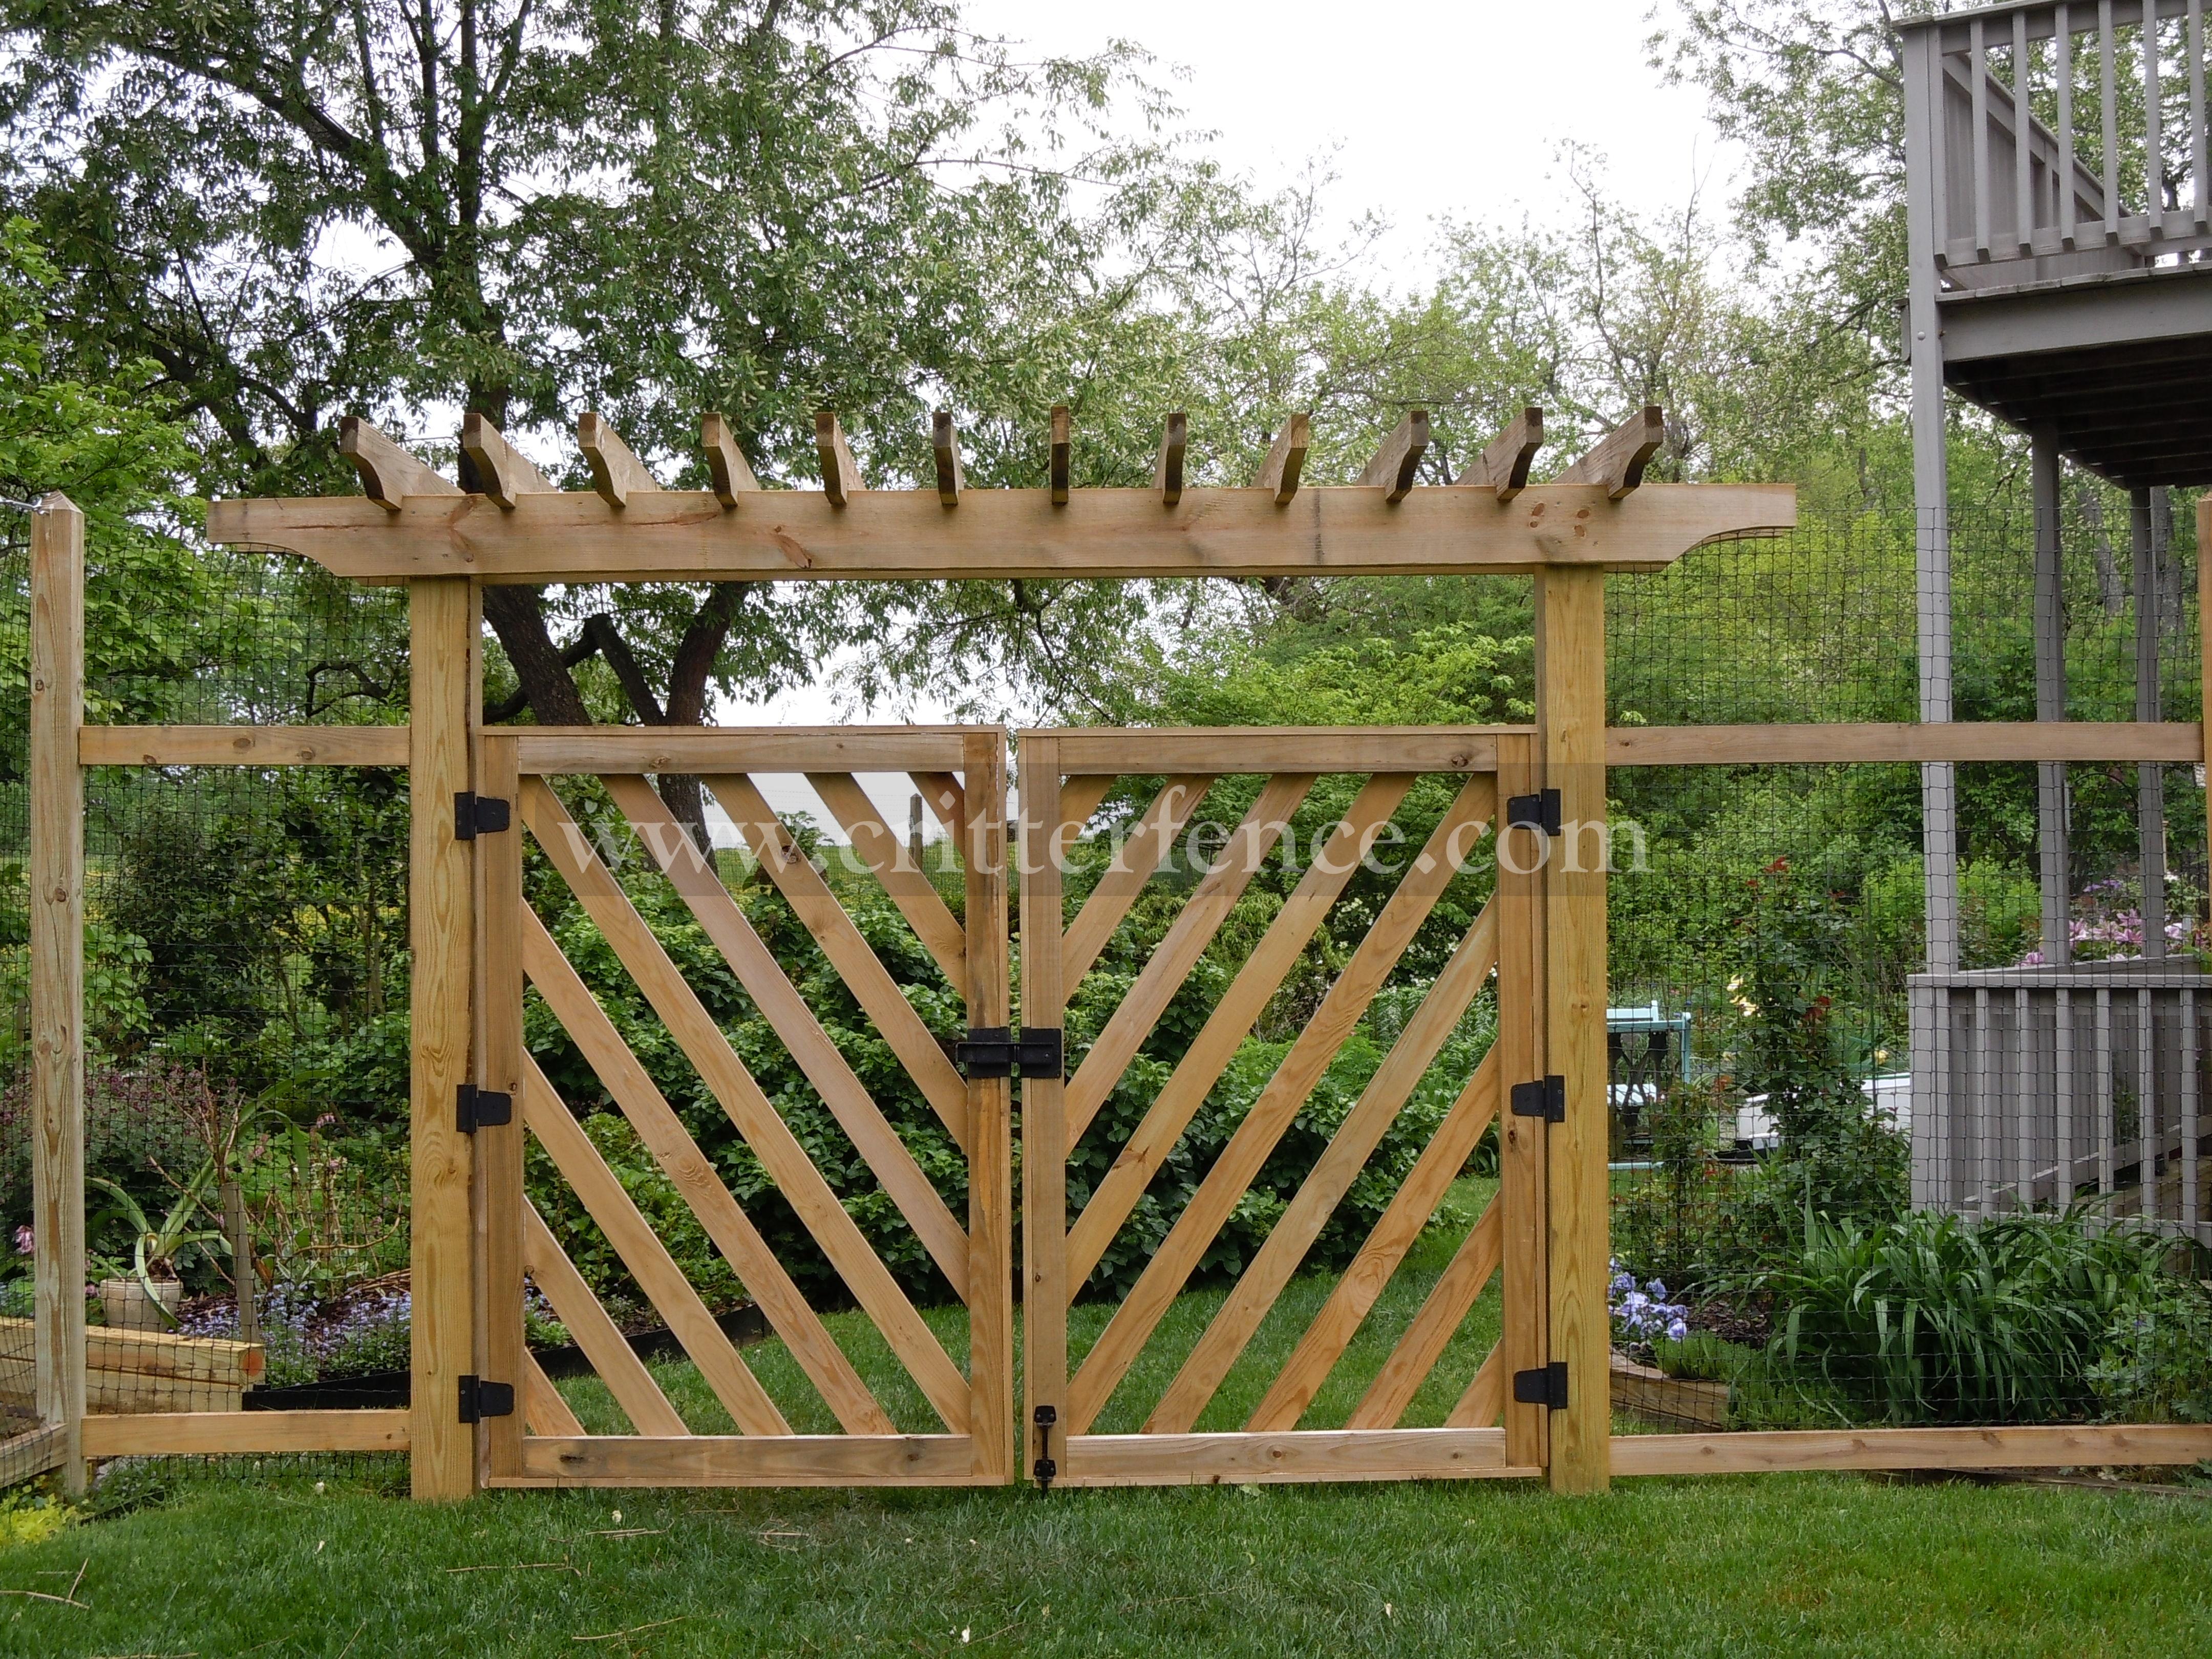 Nice wood framing and gates using Critterfence 1100 Maryland